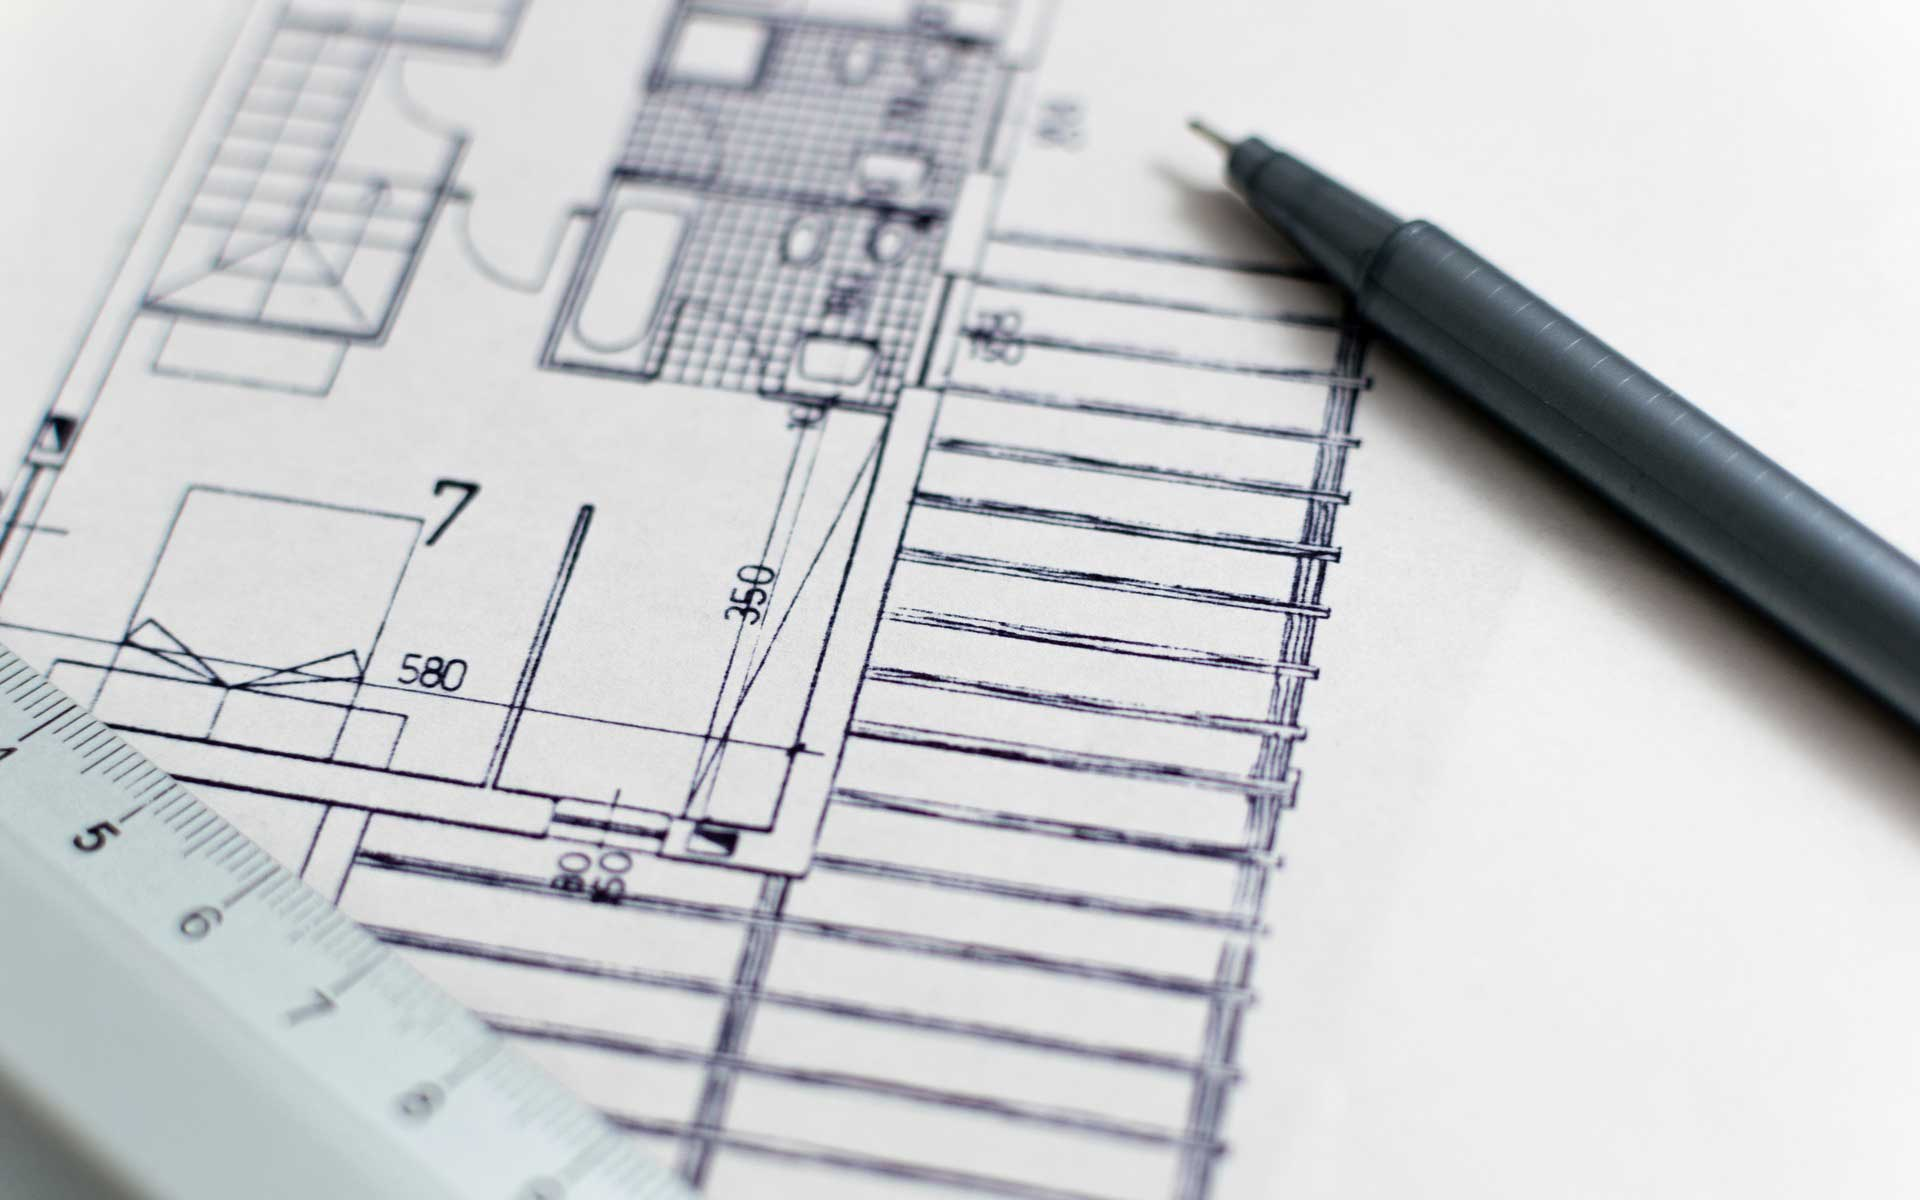 Pen and Blueprint